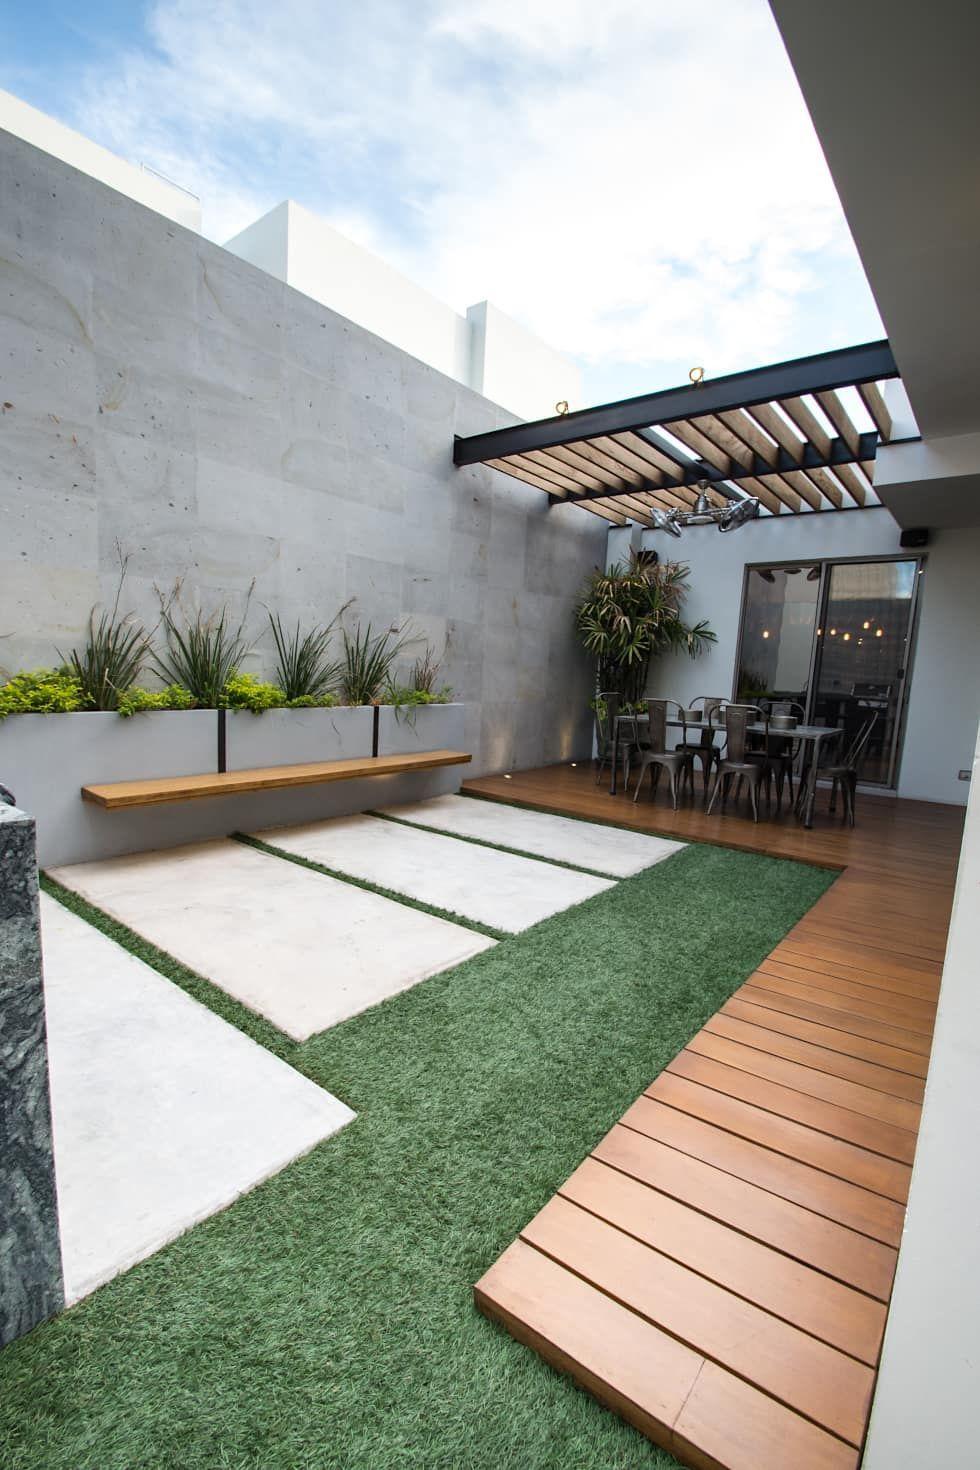 Terrazas De Estilo Por Tamen Arquitectura Diseno De Terraza Diseno De Patio Decoracion De Patio